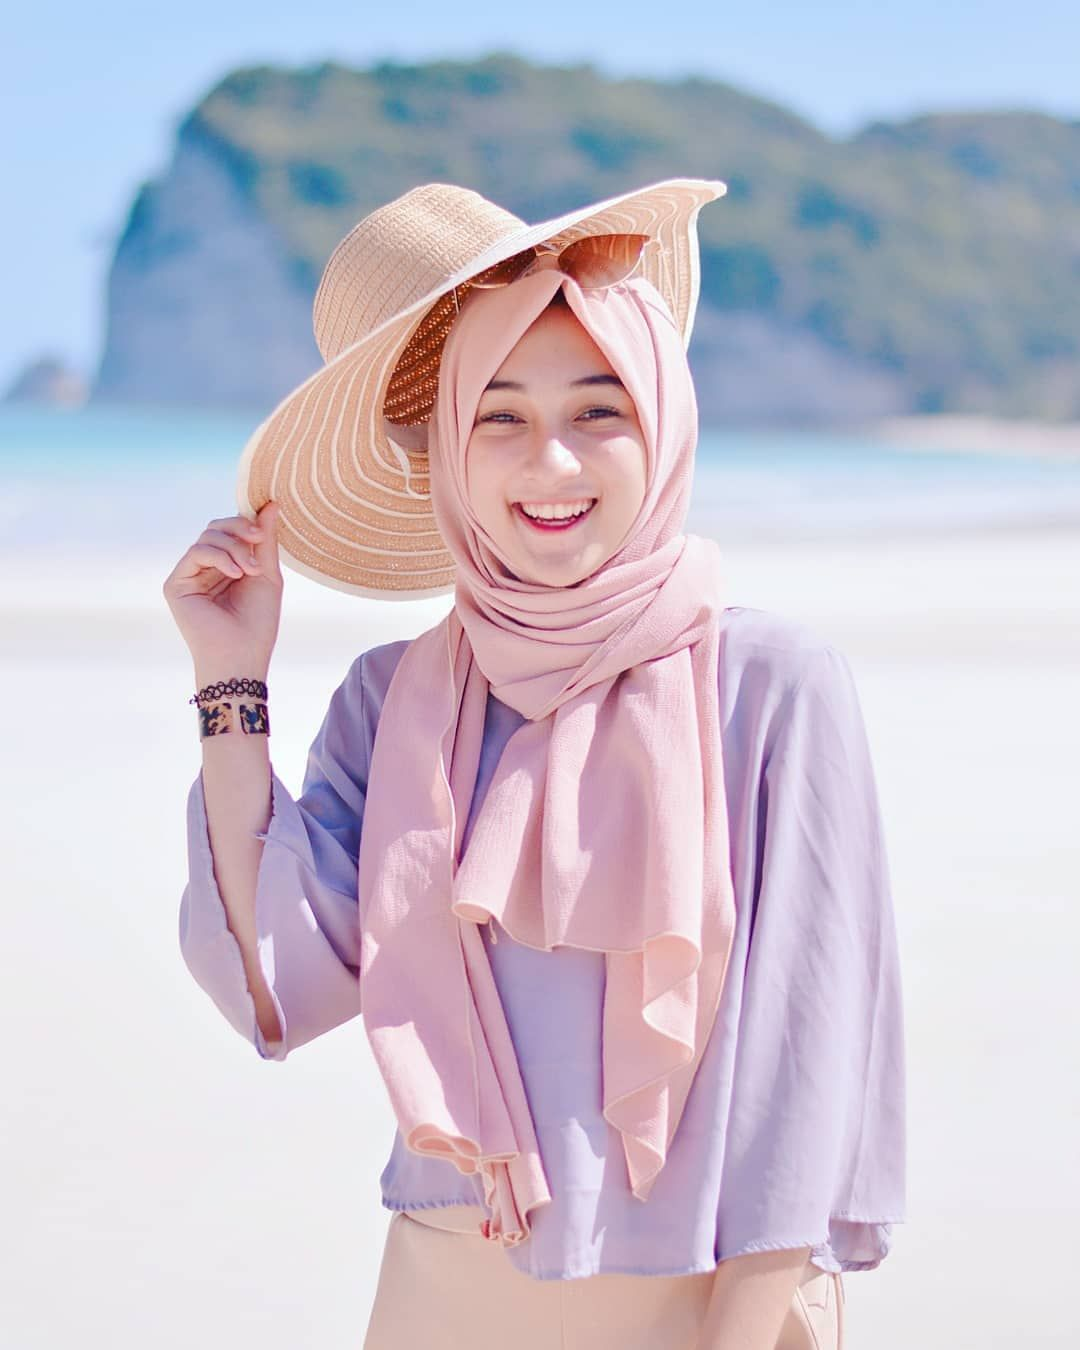 Undefined Pakaian Pantai Baju Pantai Hijab Chic